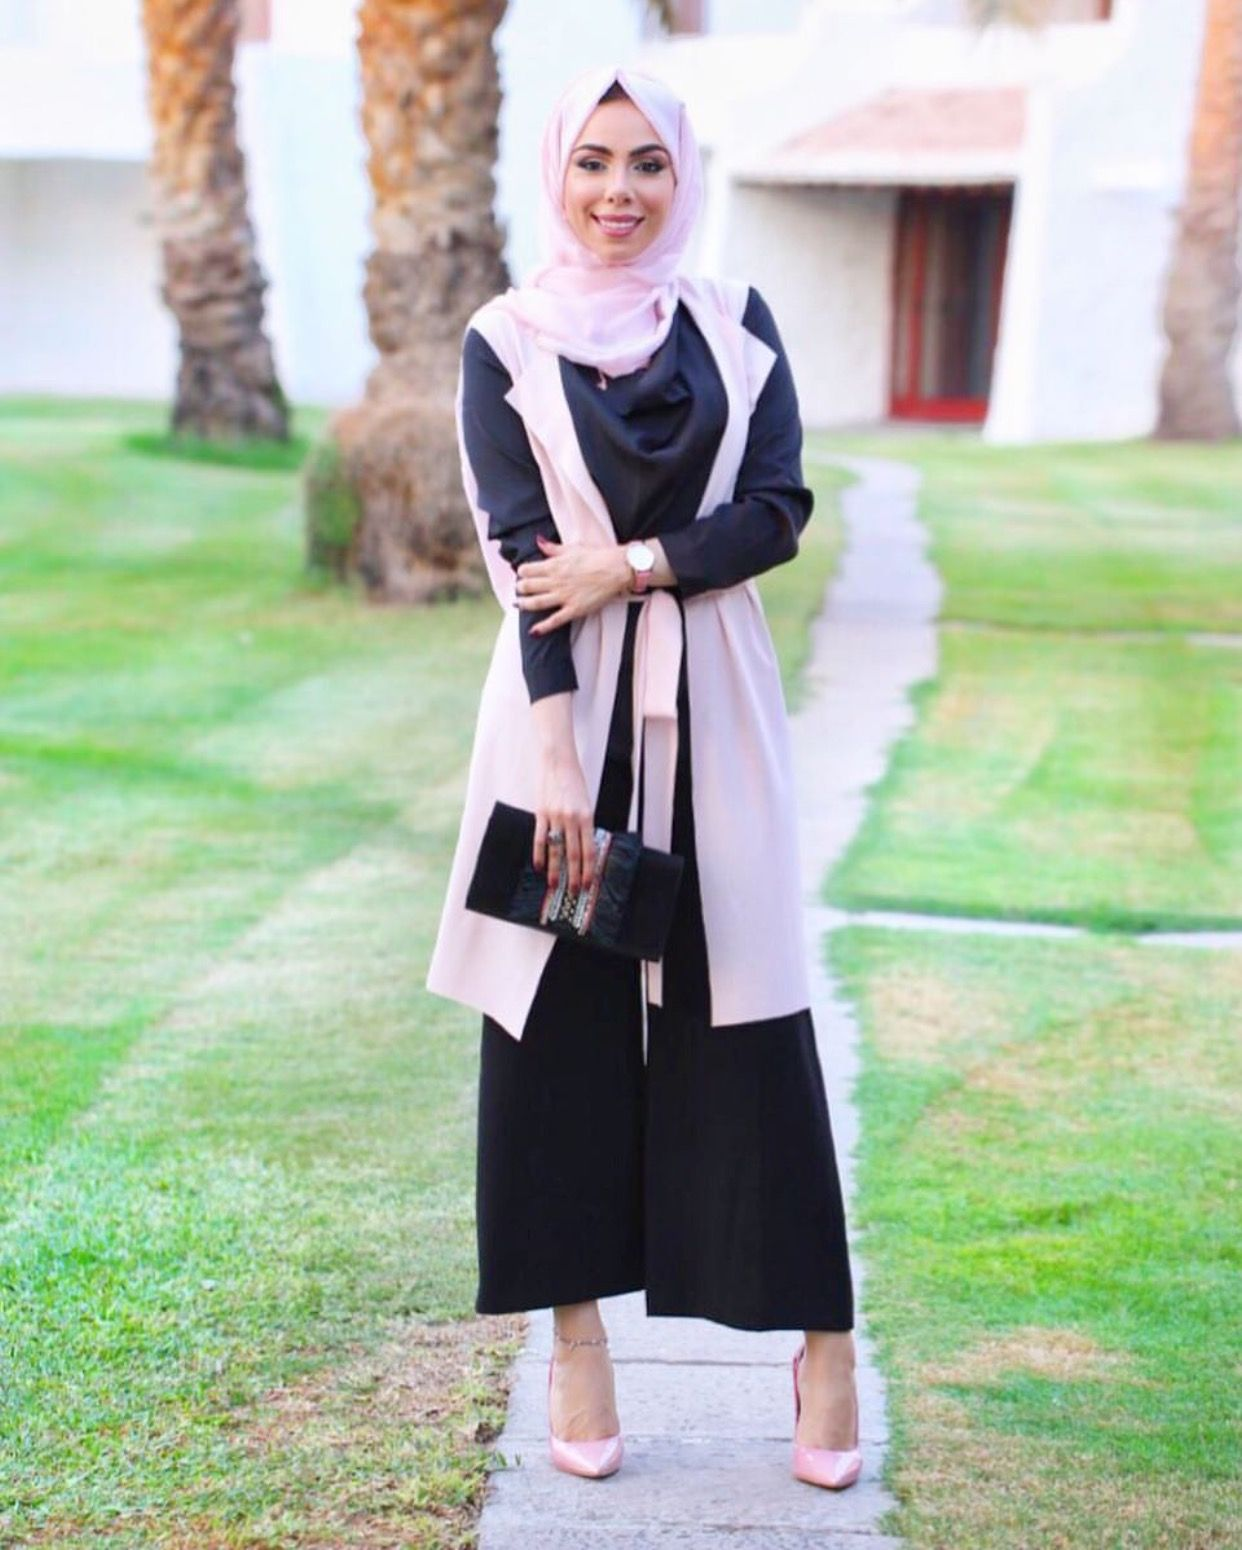 Extrêmement Pinterest @adarkurdish   Mode hijab   Pinterest   Mode hijab et Mode KL39